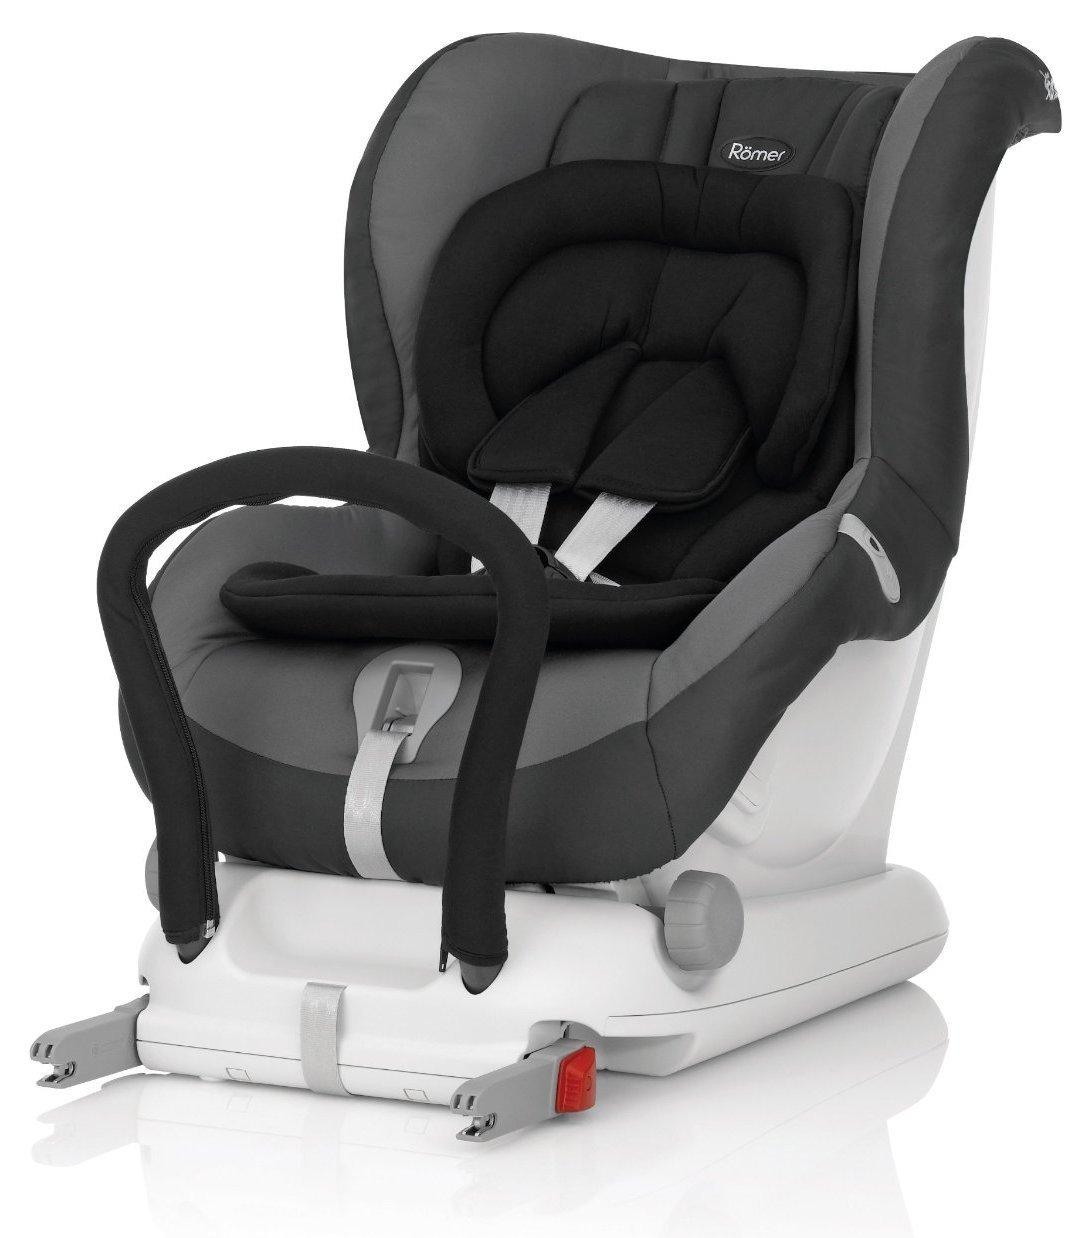 r mer maxfix 2 kinder autositze kaufenkinder autositze. Black Bedroom Furniture Sets. Home Design Ideas